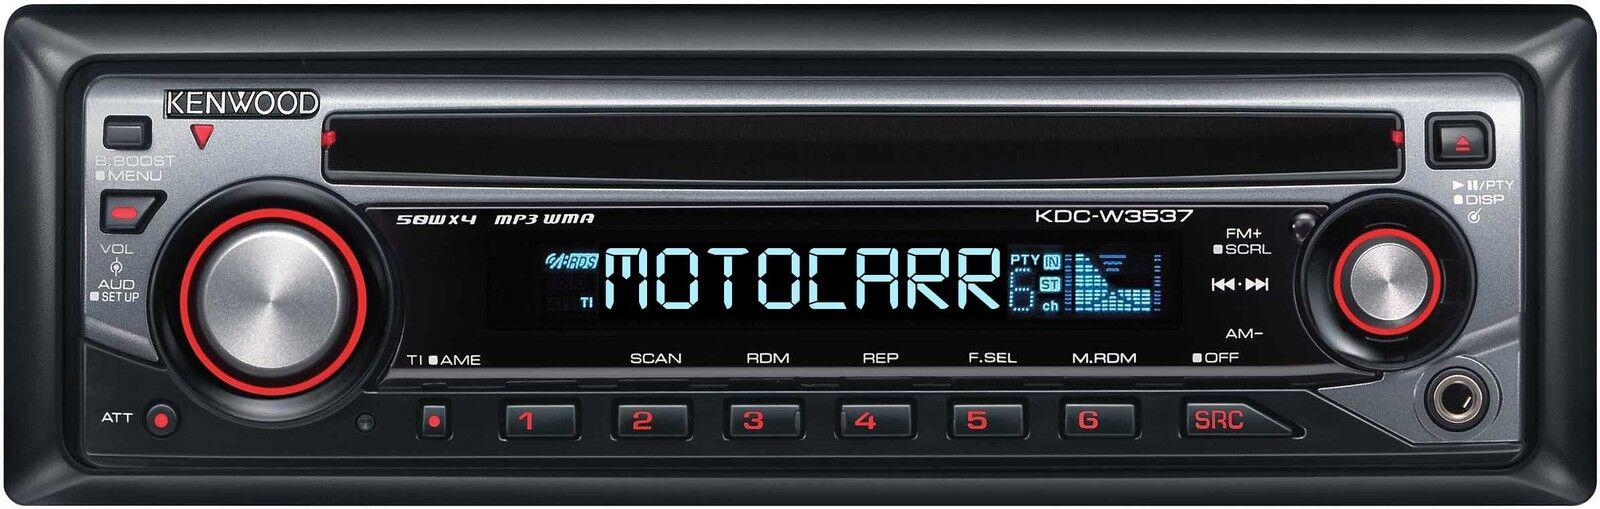 MotoCARR_Electronics